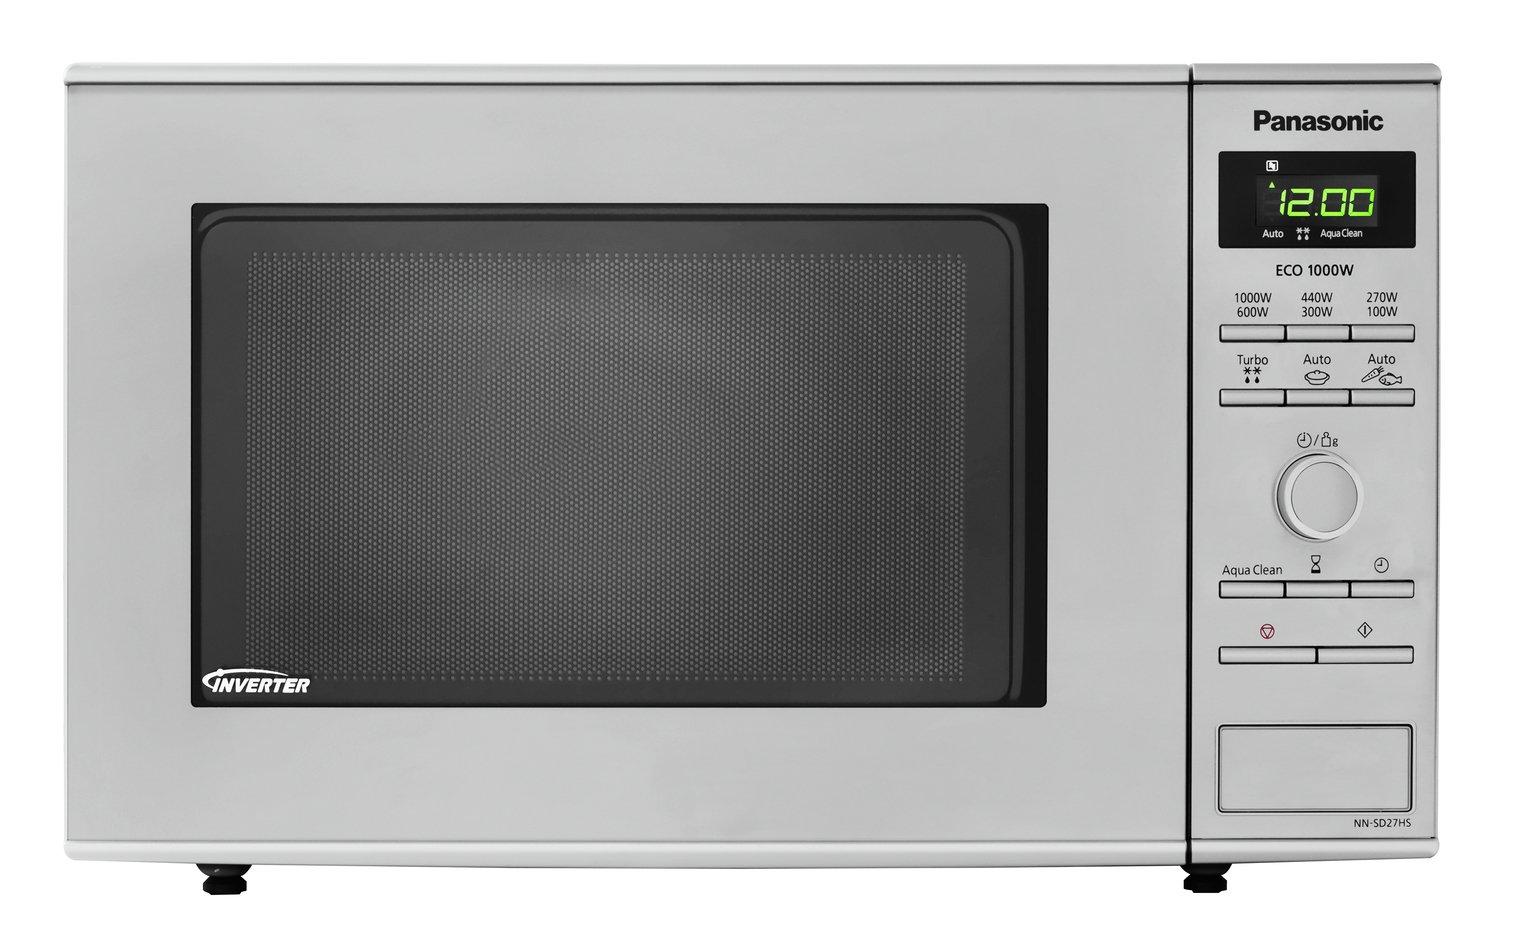 Panasonic 1000W Standard Microwave NNSD27HS - S.Steel